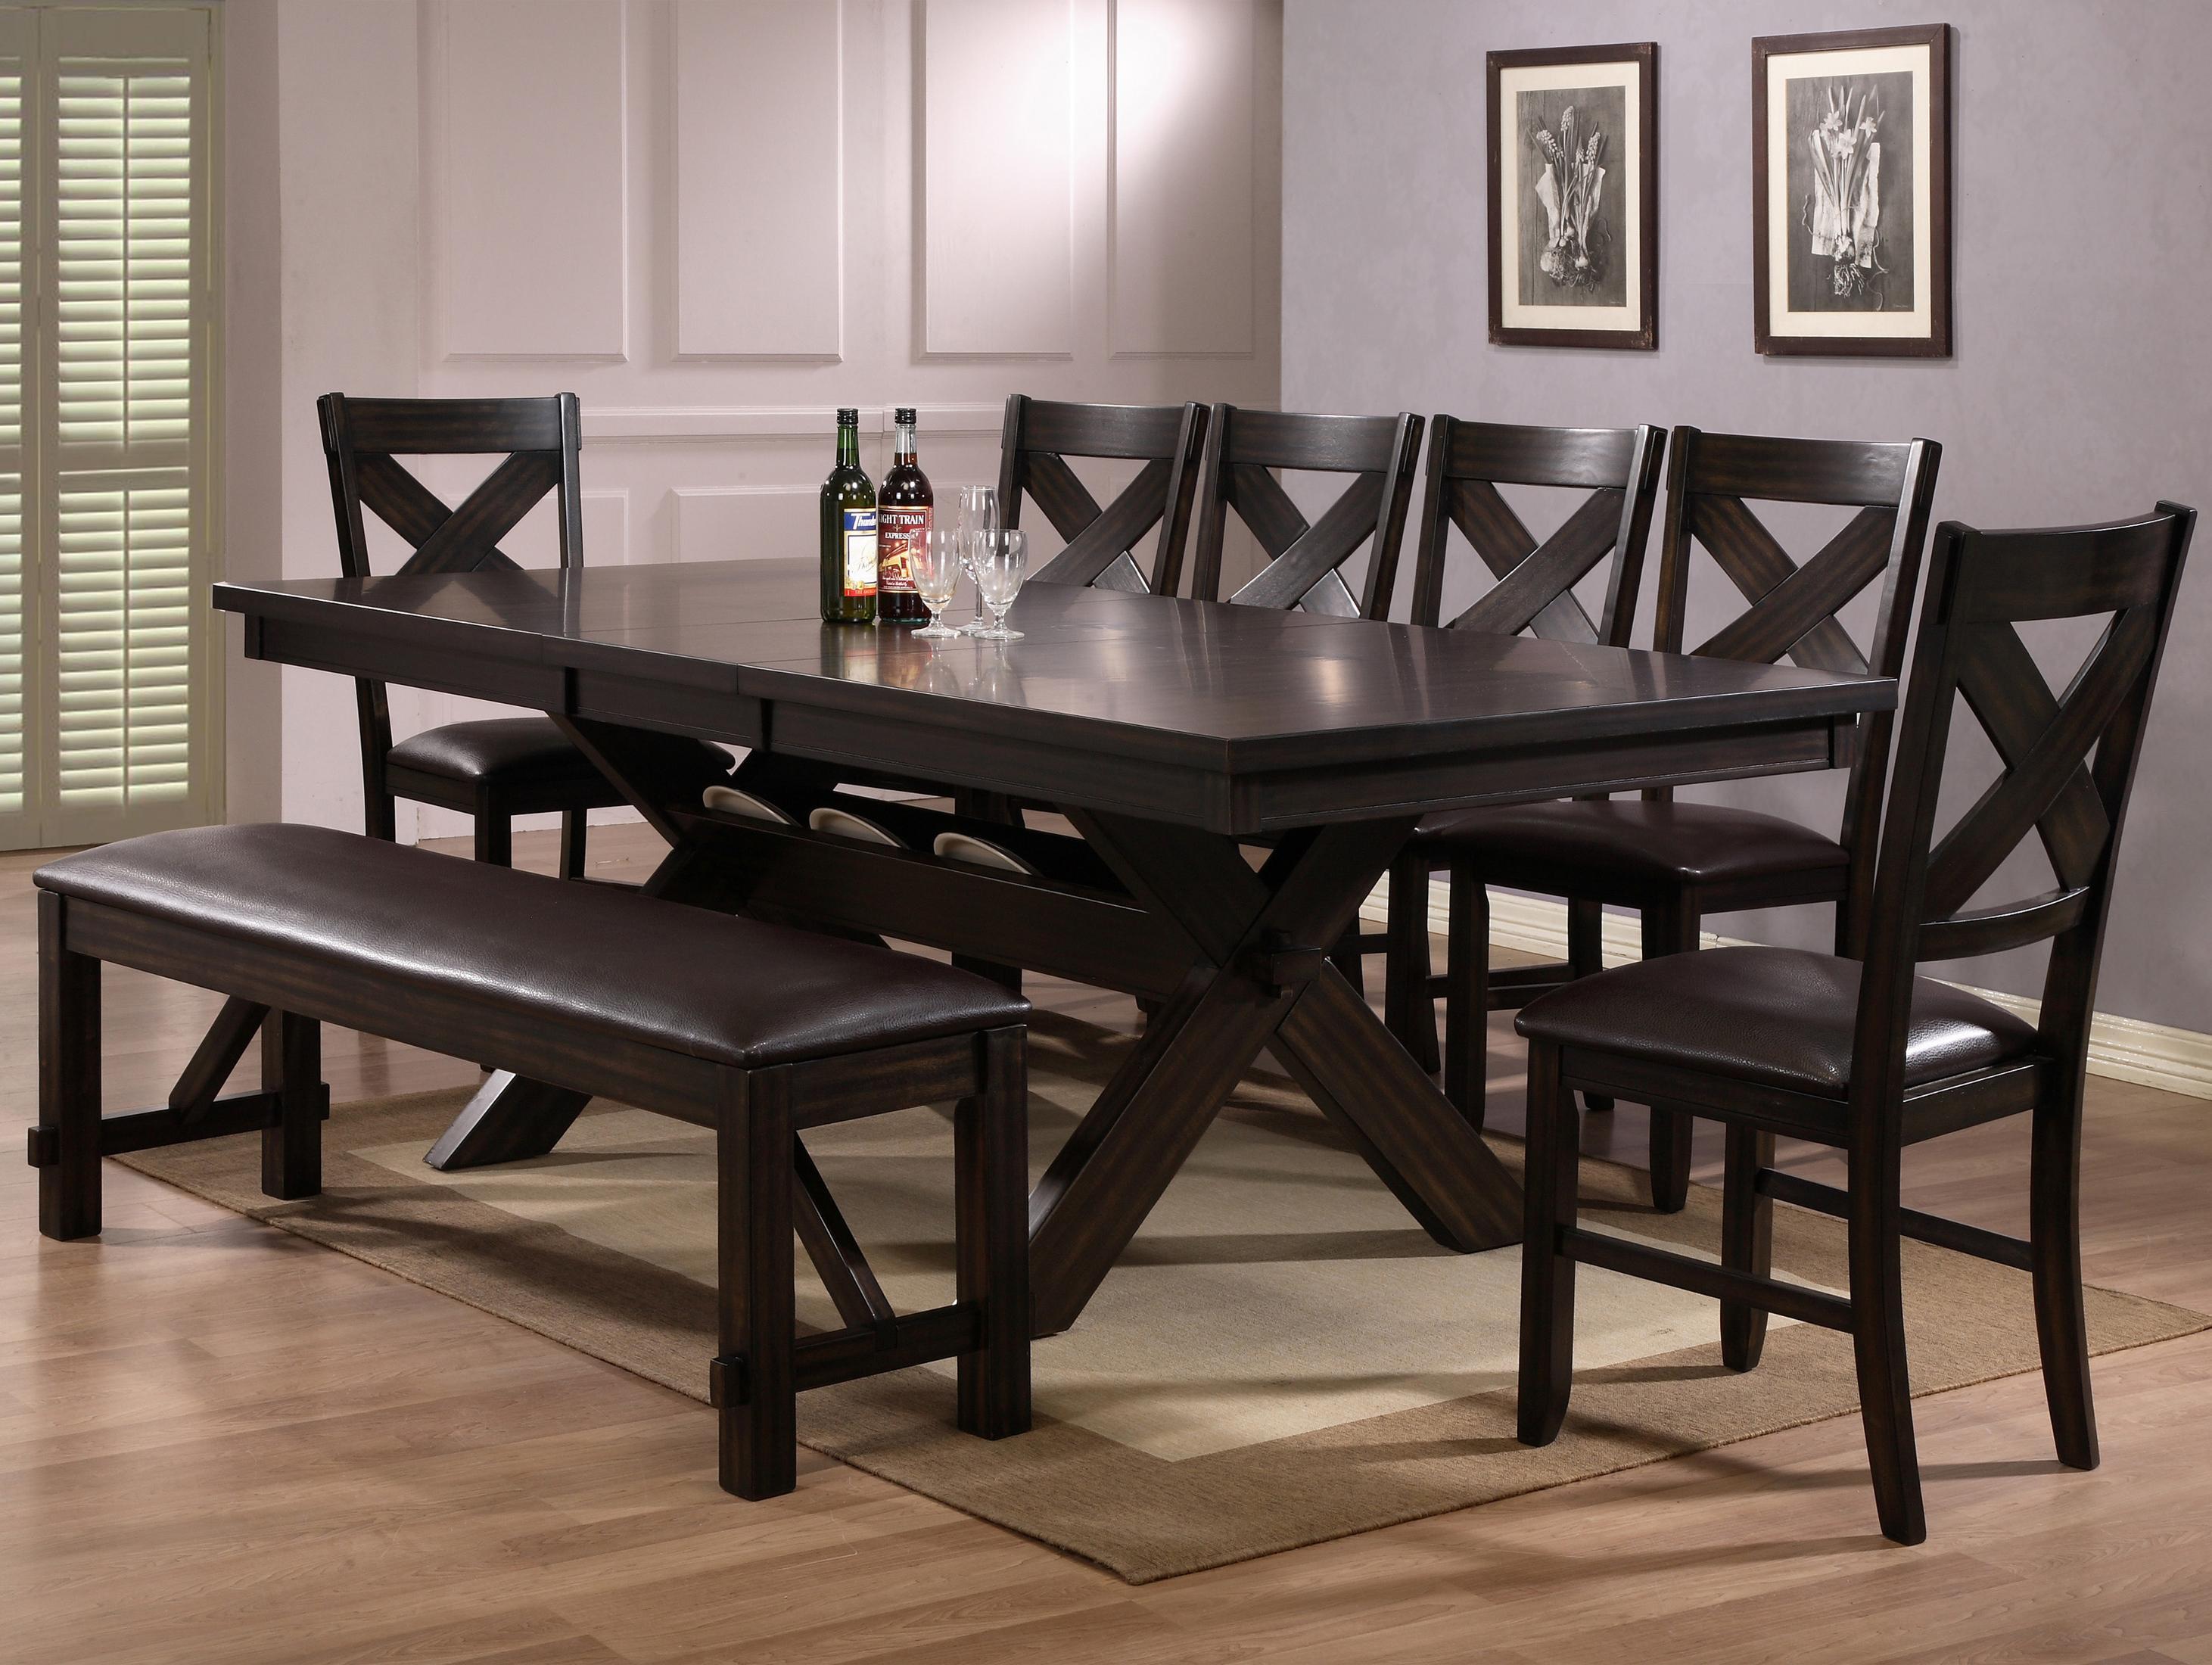 Beau Crown Mark Havana 8 Piece Dining Table, Chair U0026 Bench Set